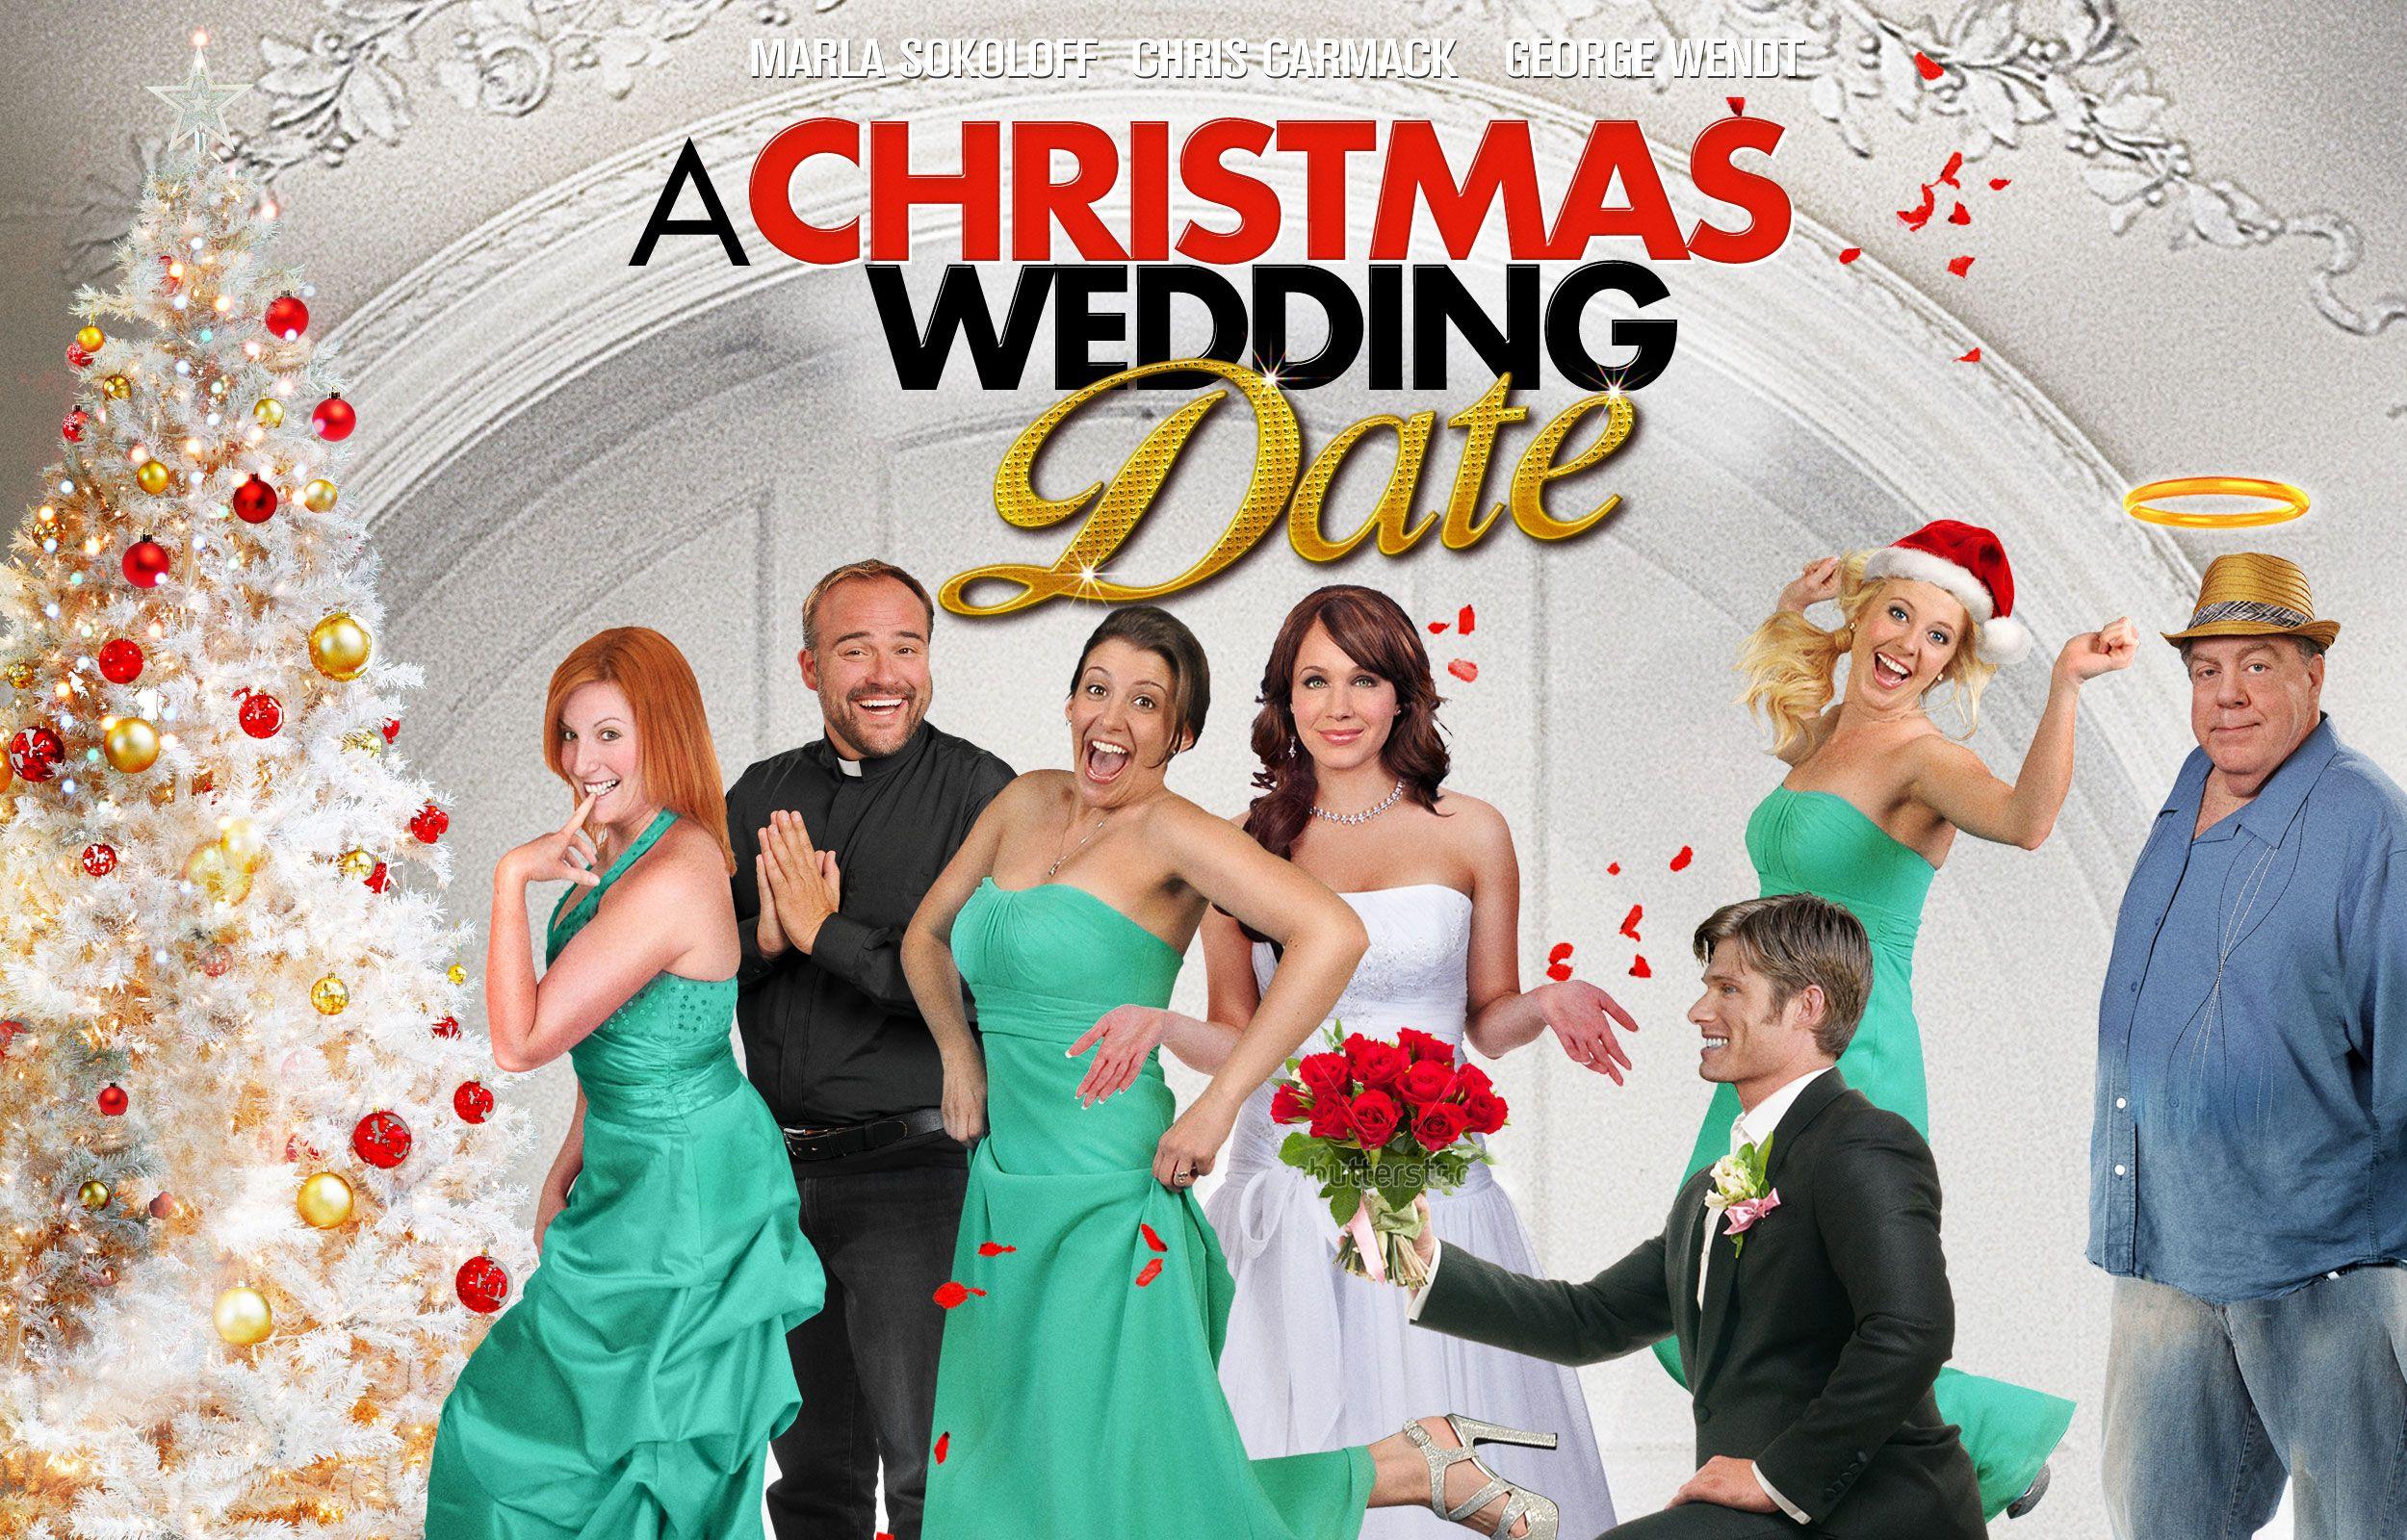 A Christmas Wedding Date.A Christmas Wedding Date Hallmark Christmas Movies A